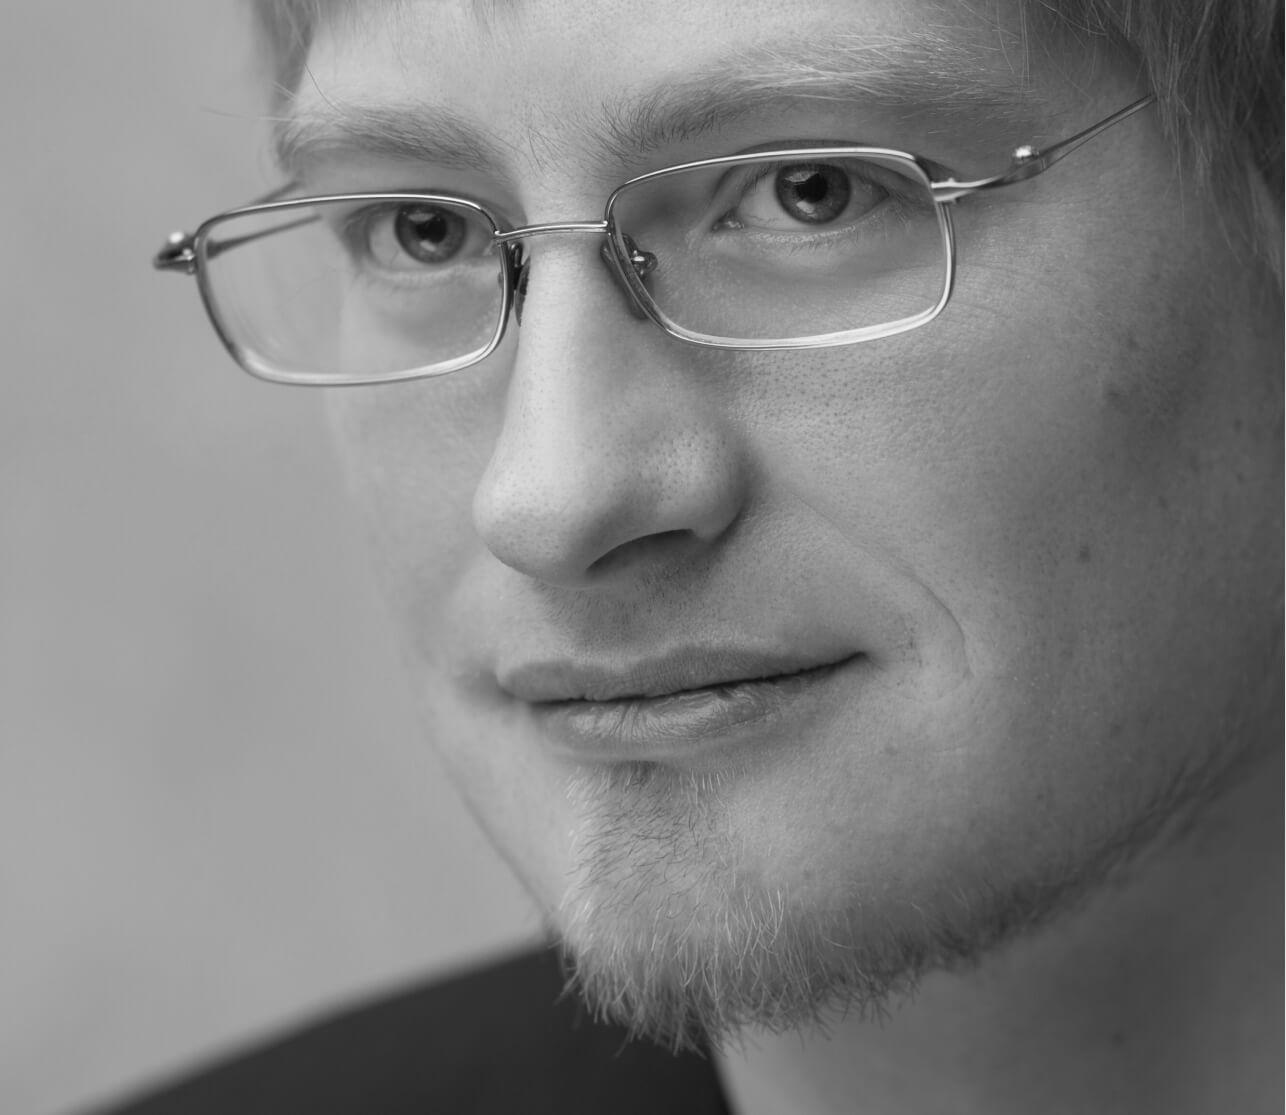 Dimitry Tuzoff